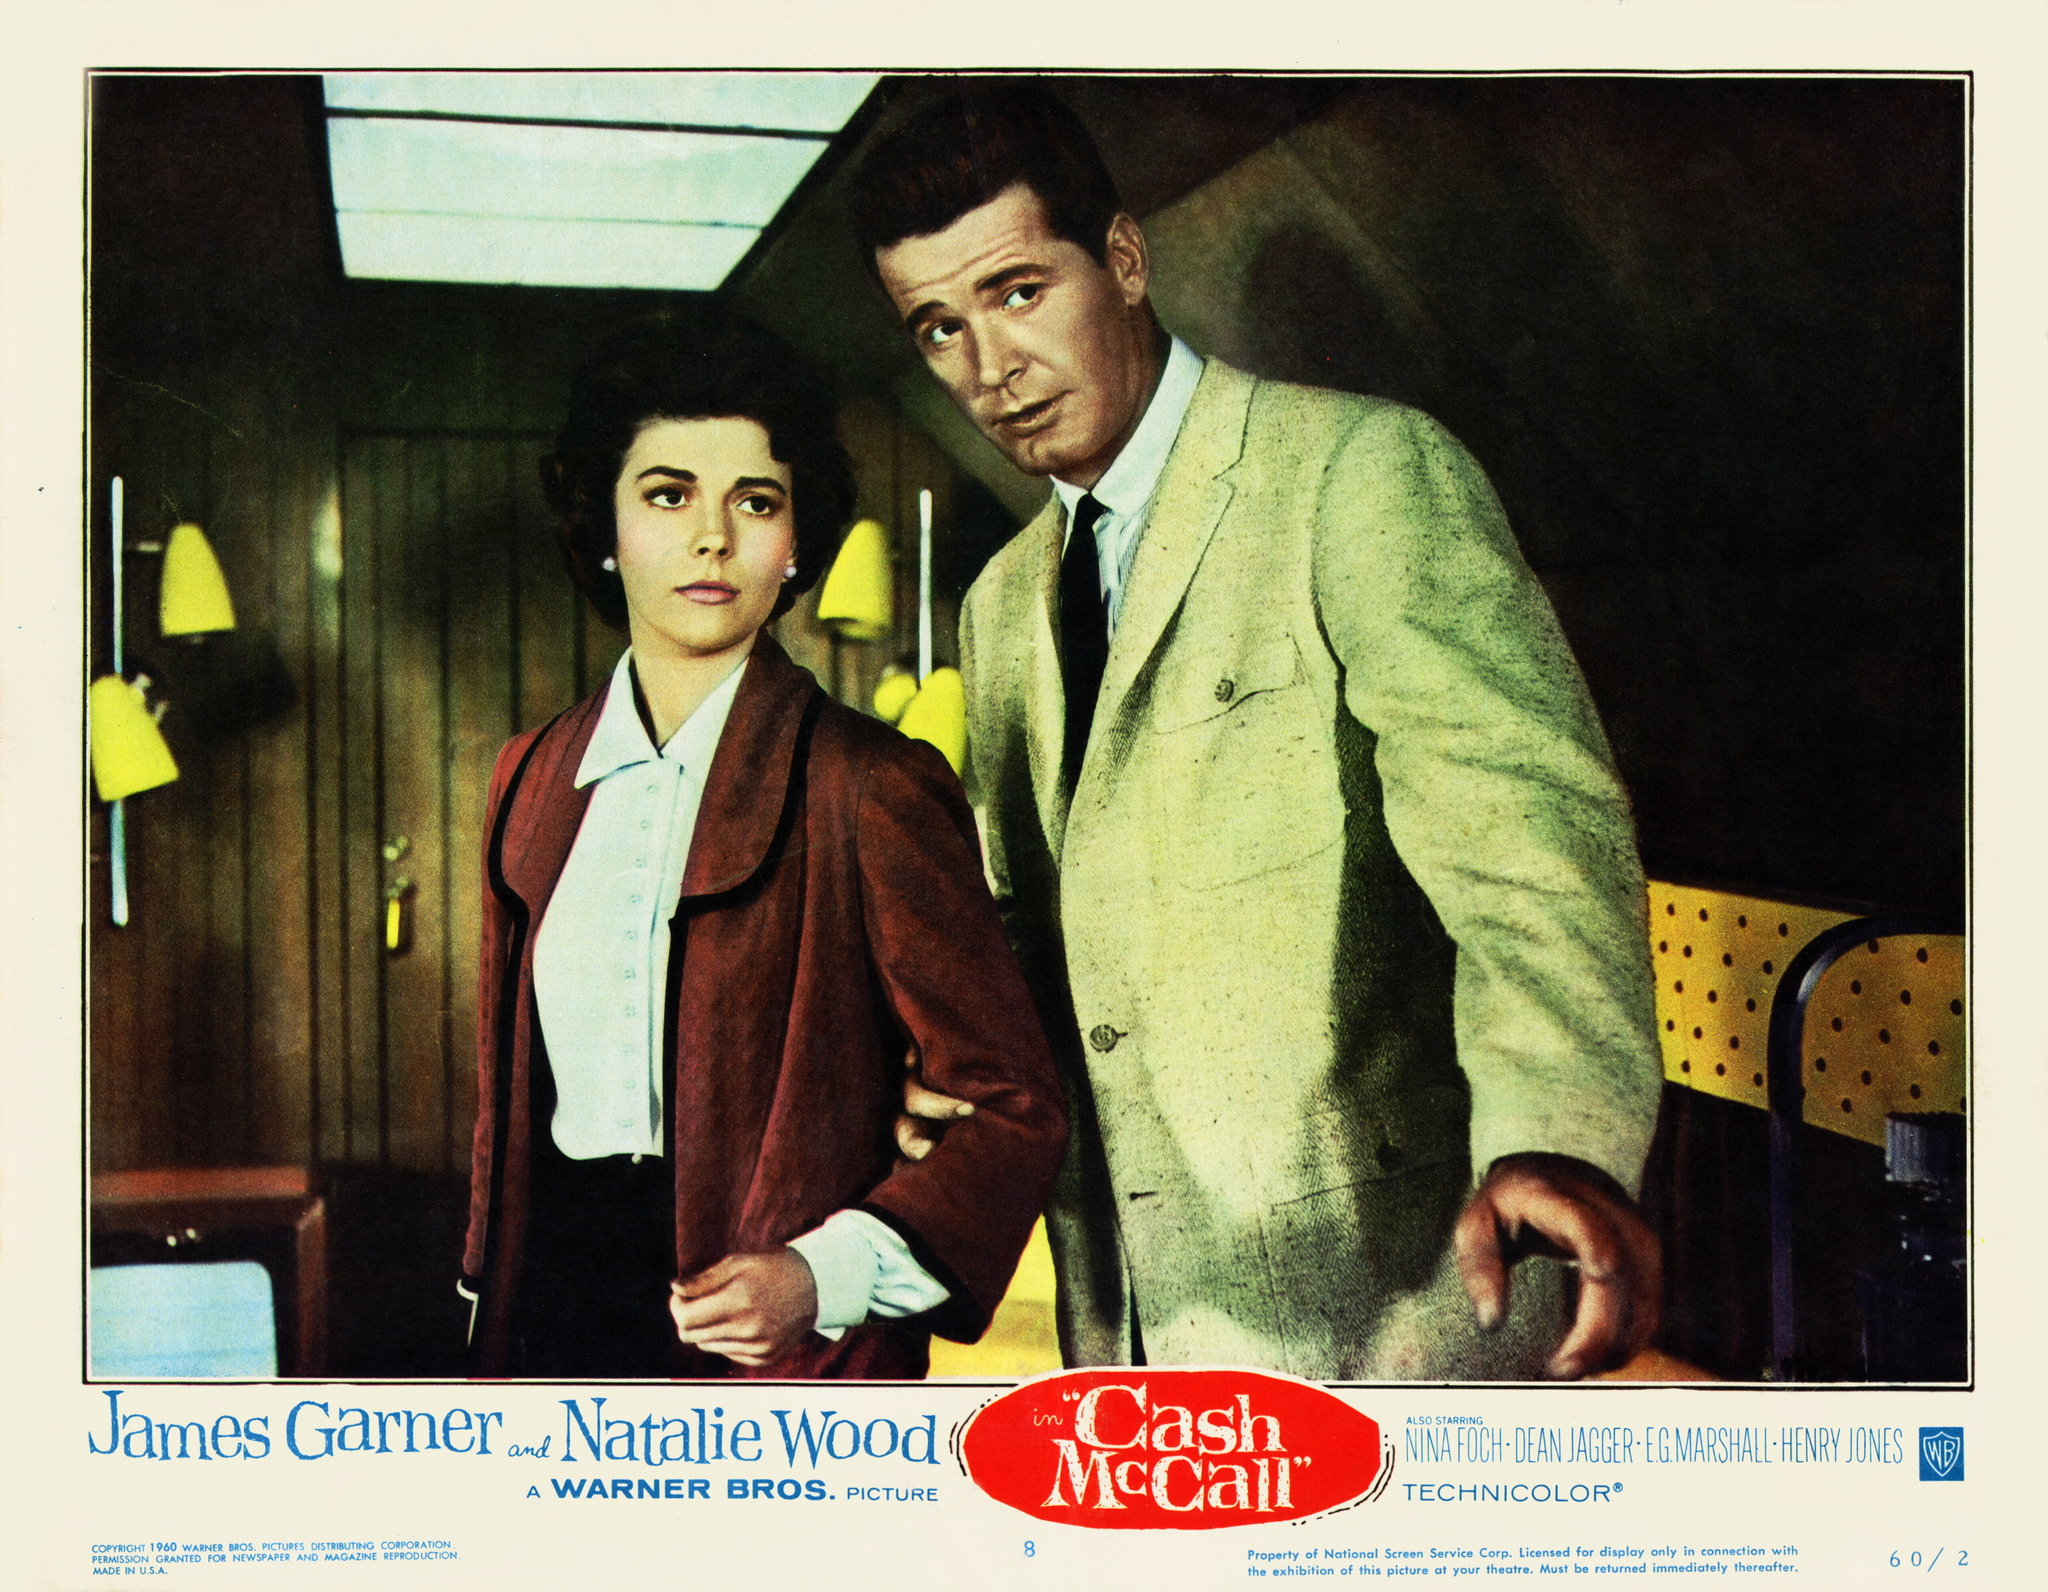 Natalie Wood and James Garner in Cash McCall (1960)